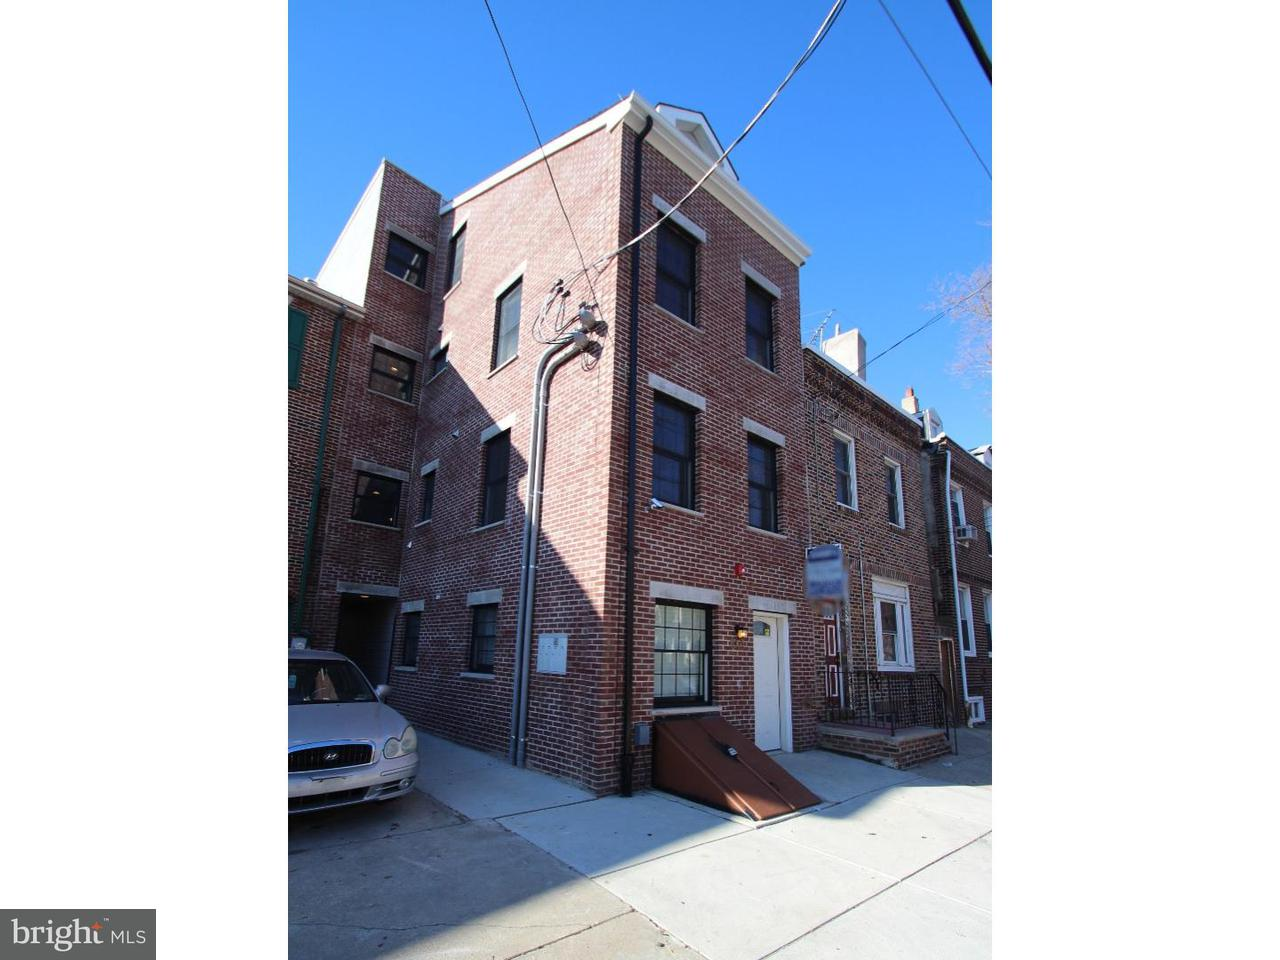 1014 E Moyamensing Philadelphia, PA 19147